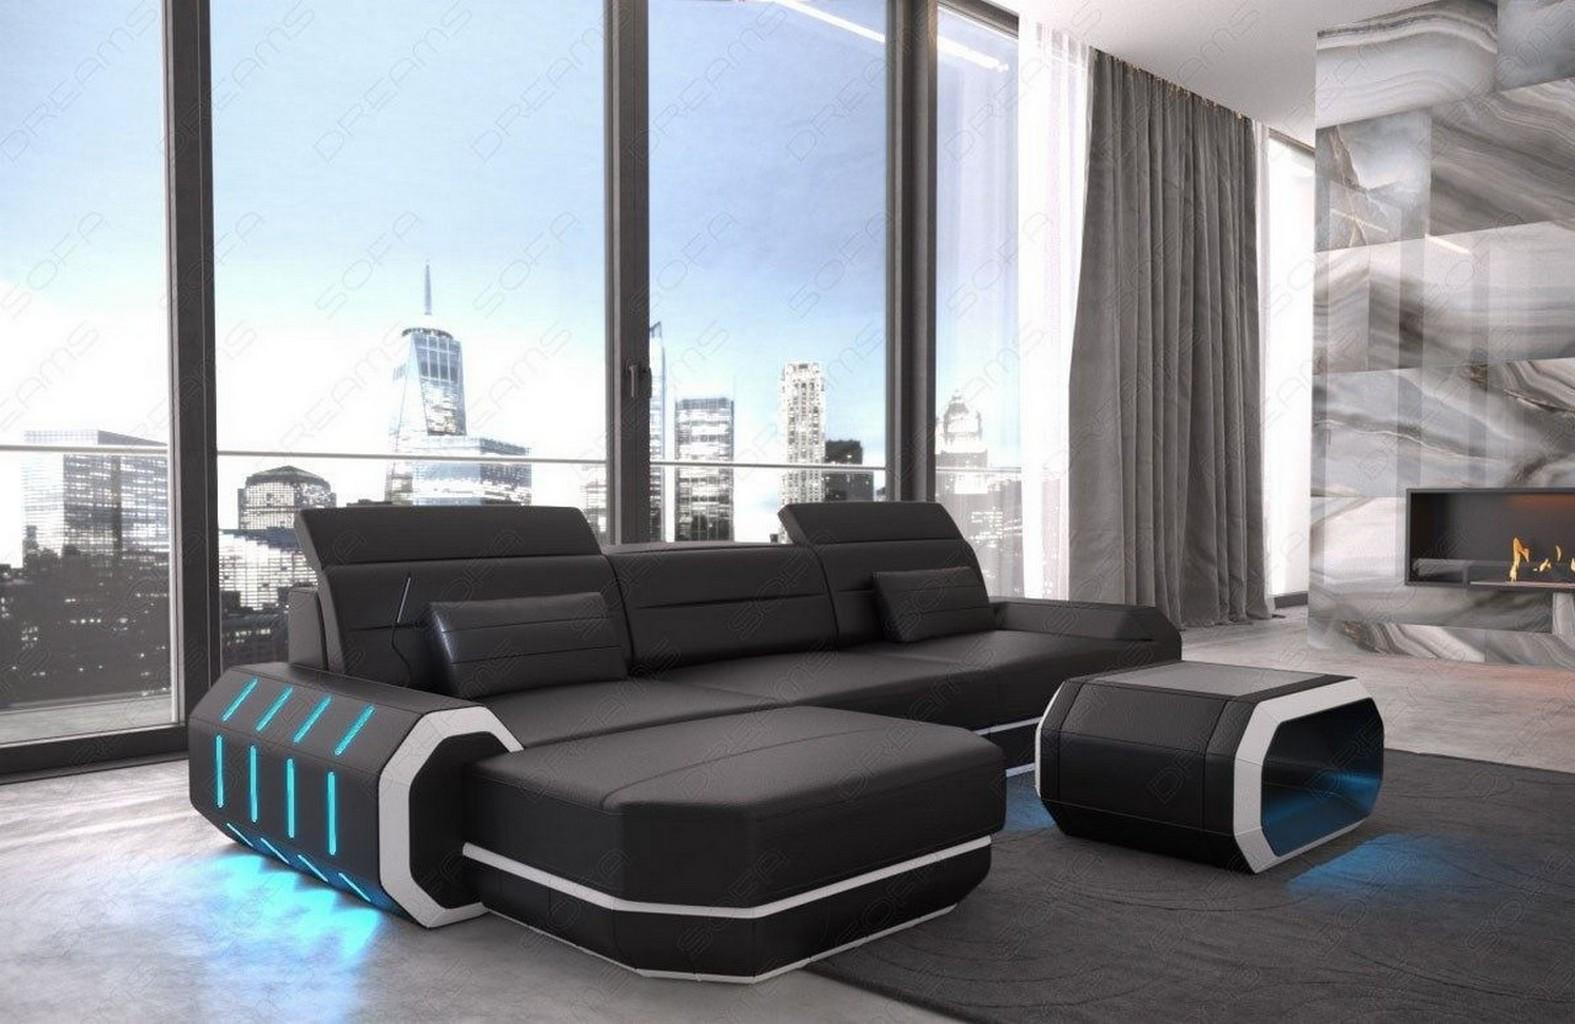 sectional sofa leather roma l shape corner sofa design. Black Bedroom Furniture Sets. Home Design Ideas